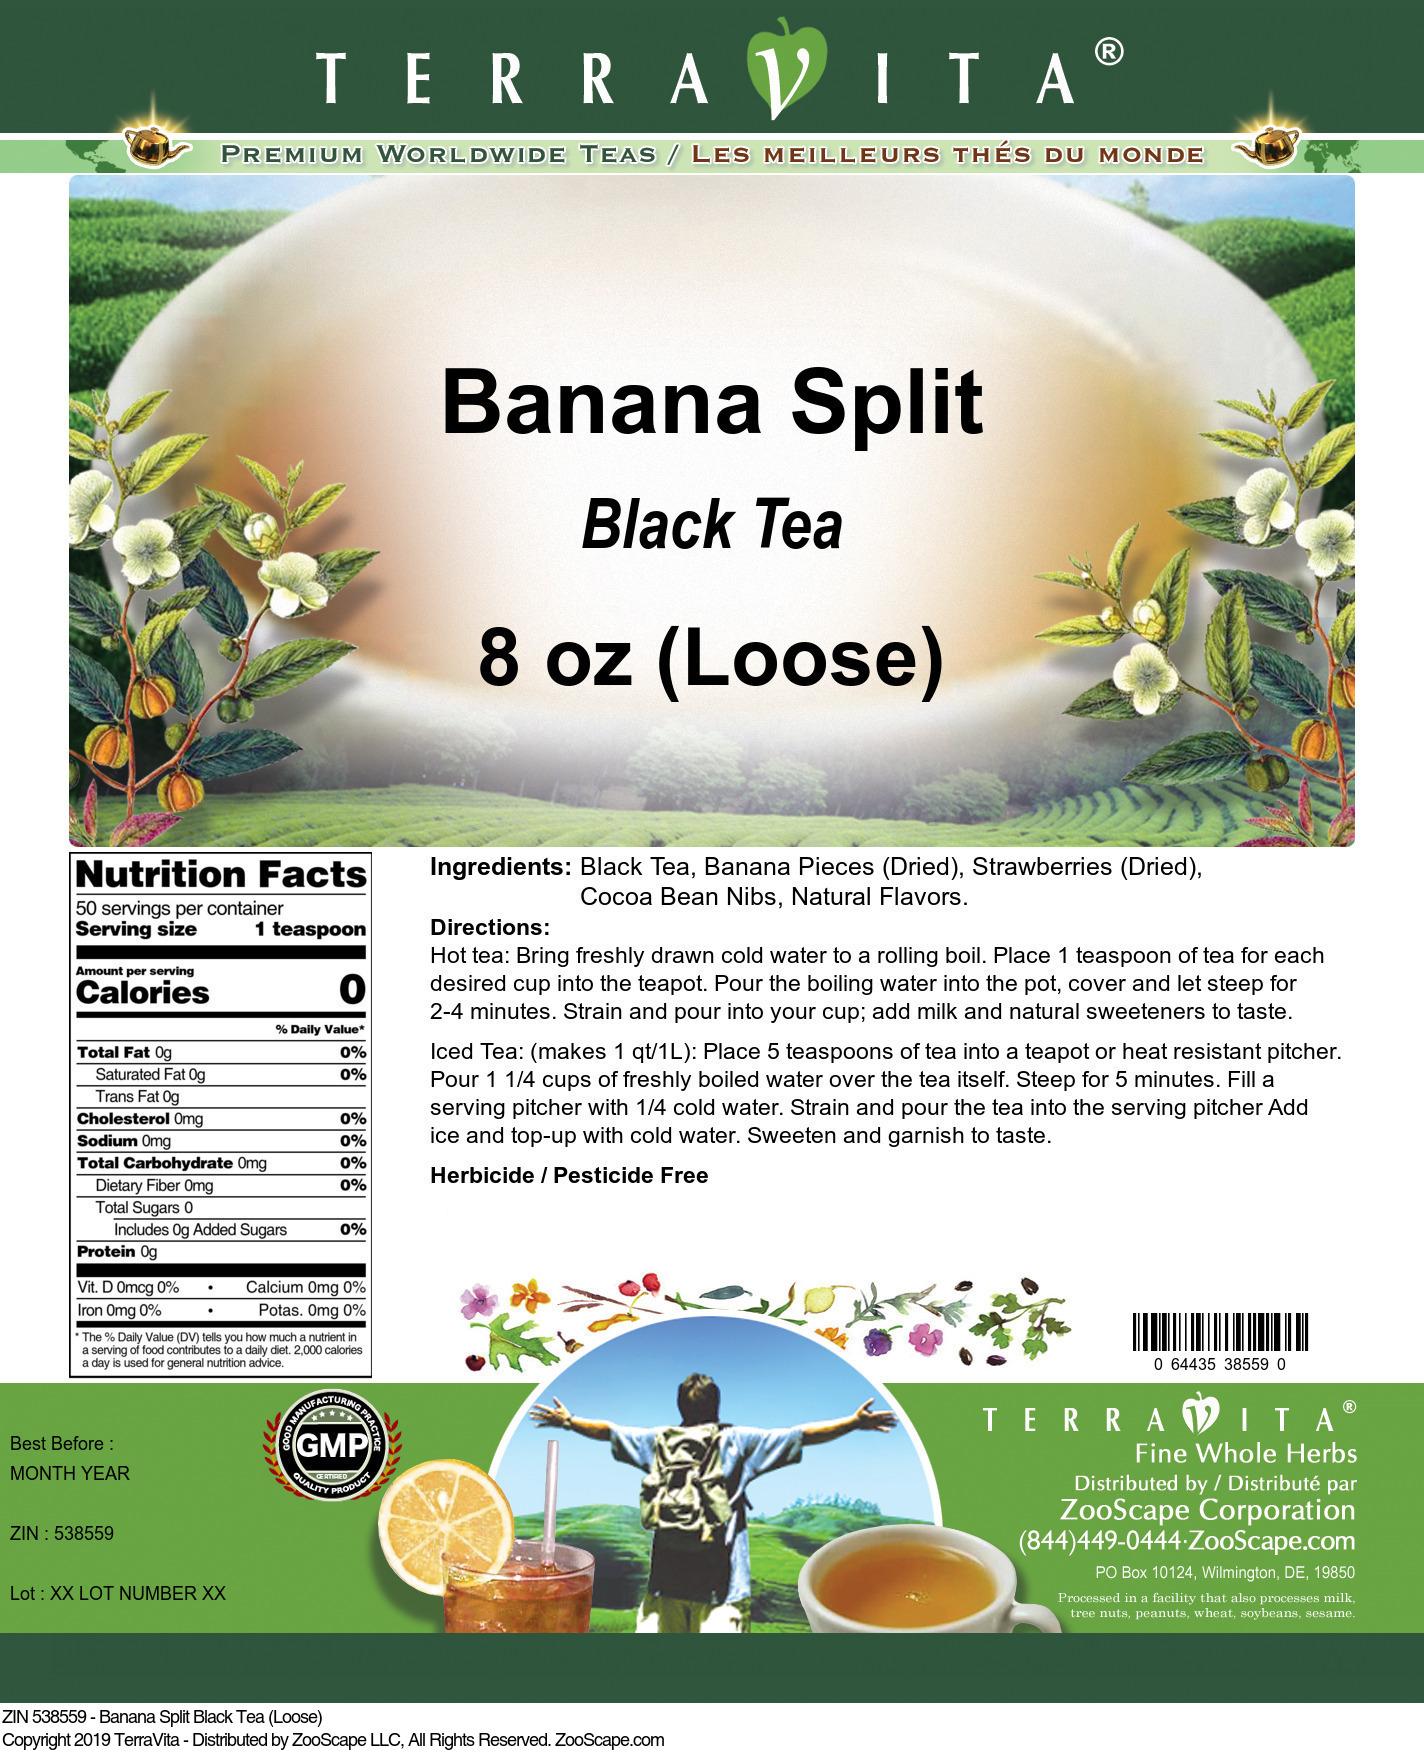 Banana Split Black Tea